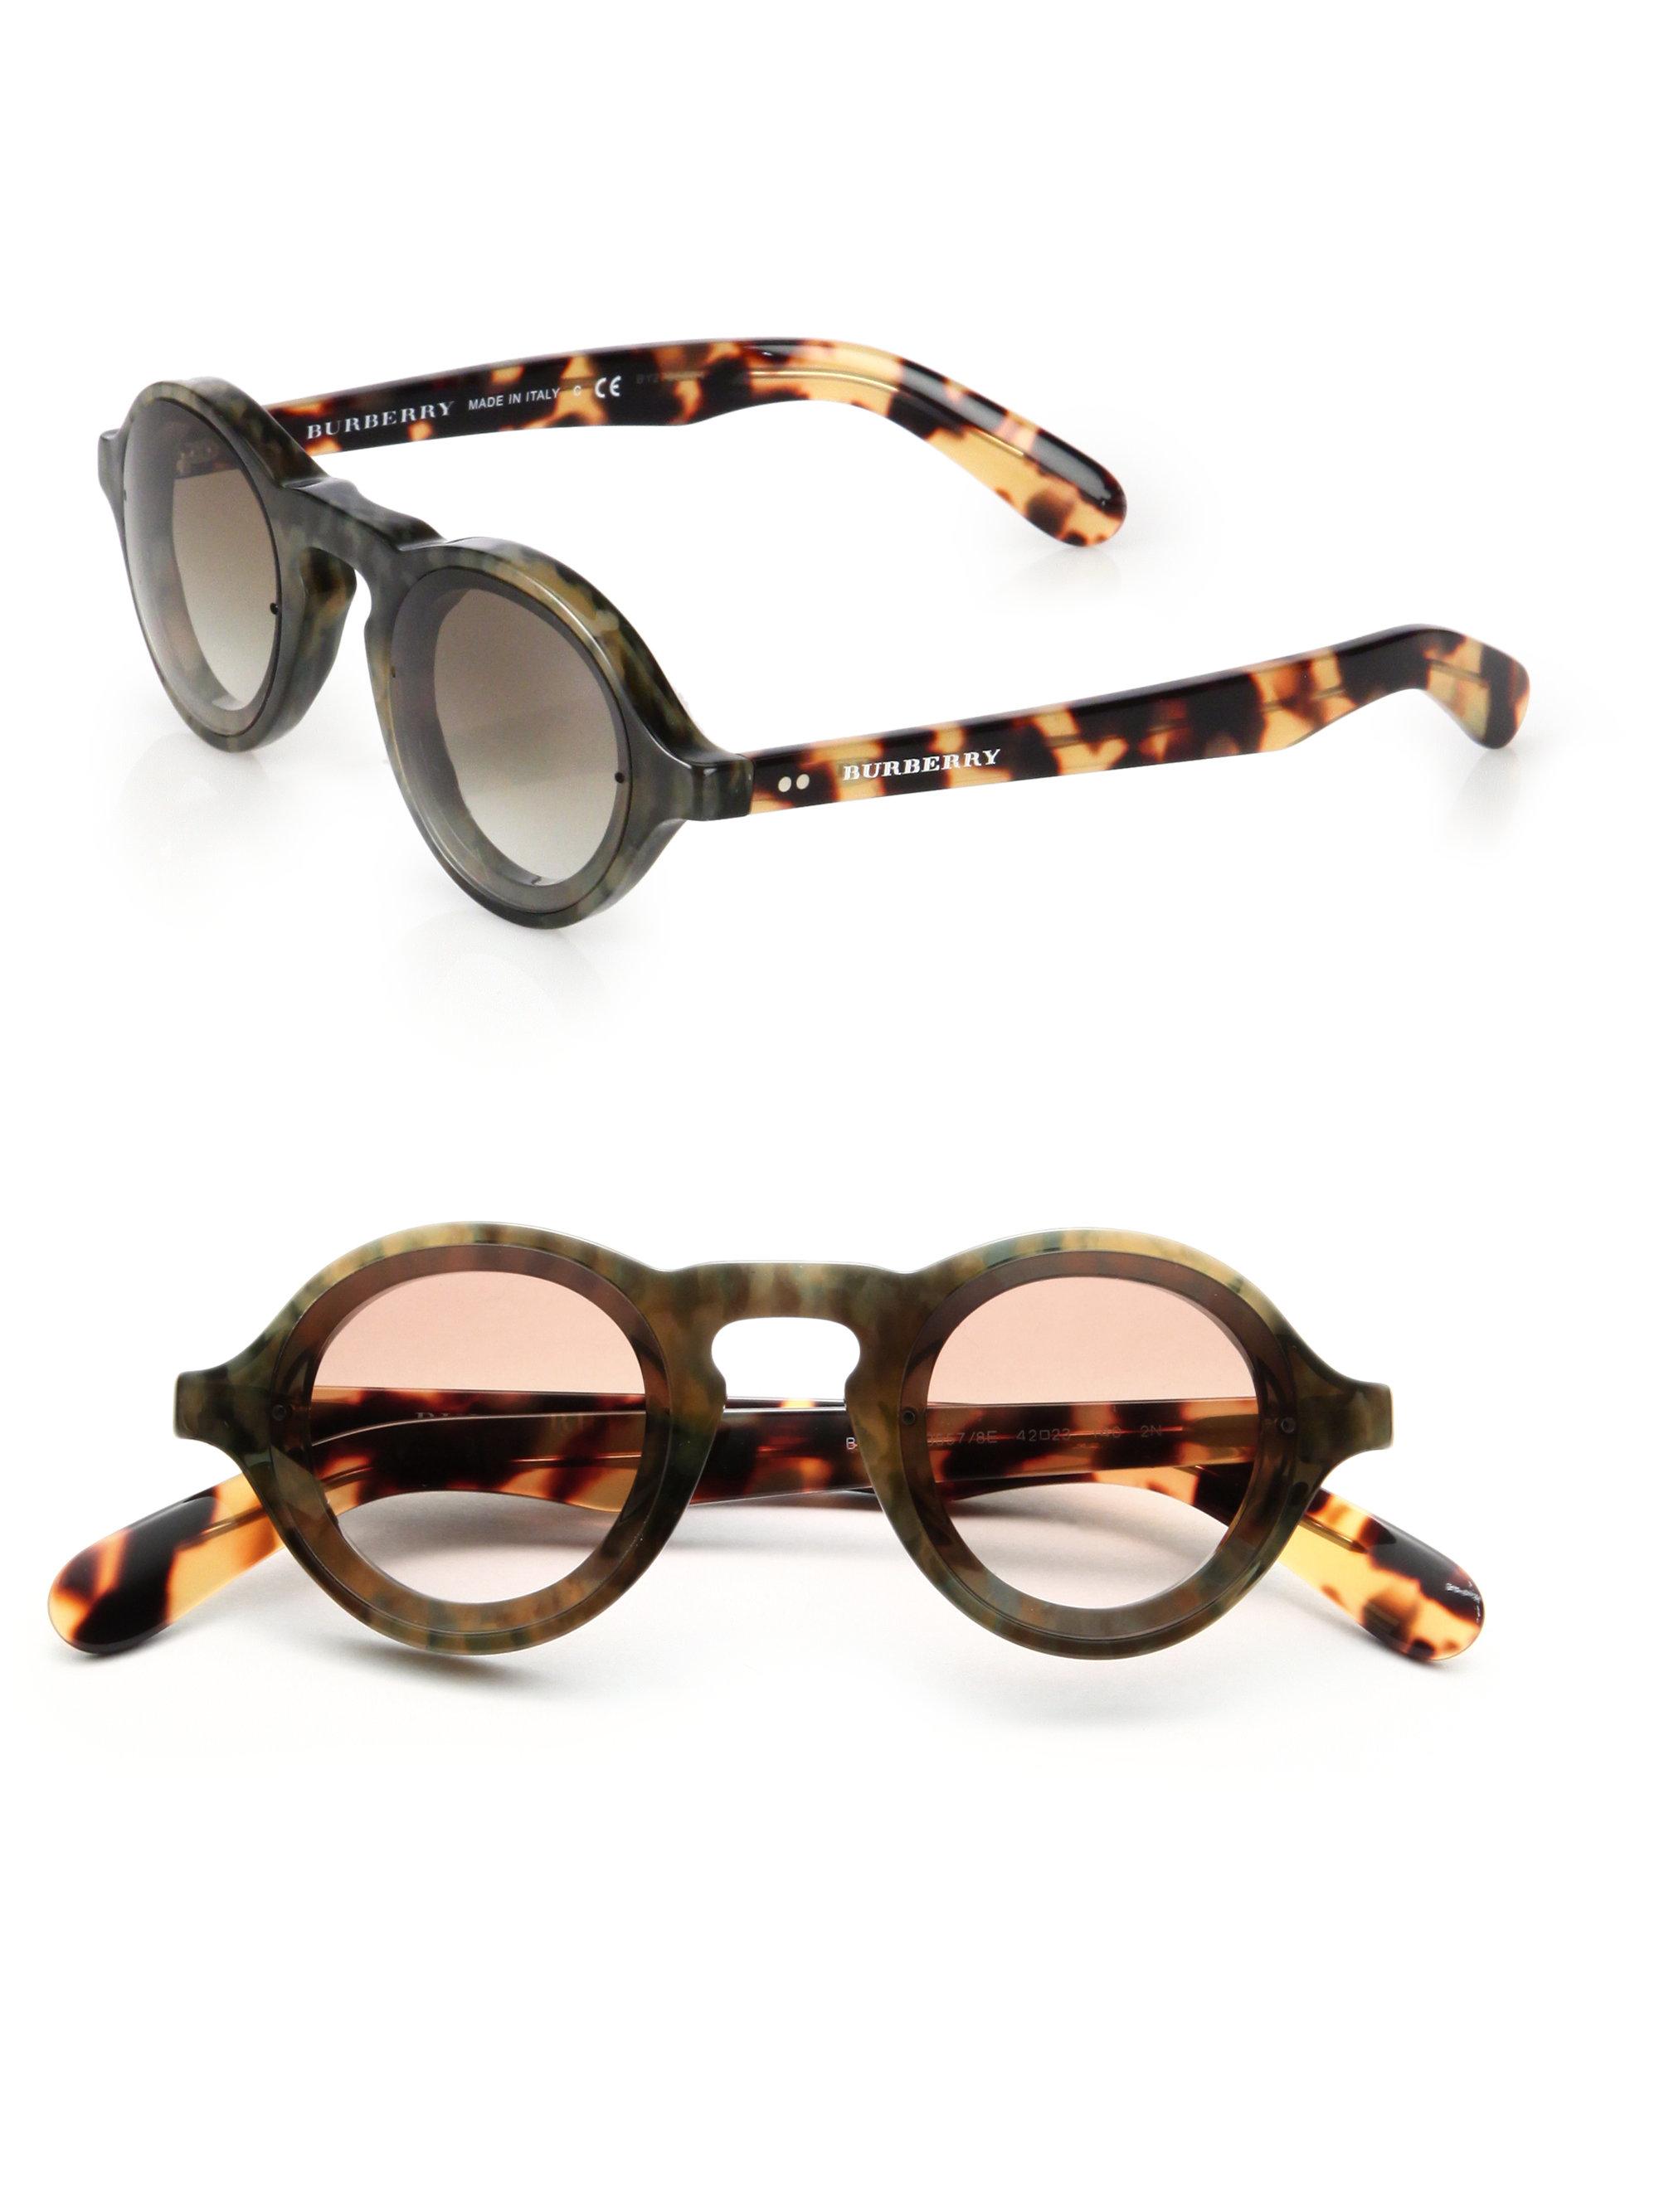 a77165d6a2 Burberry Green 42mm Round Acetate Sunglasses